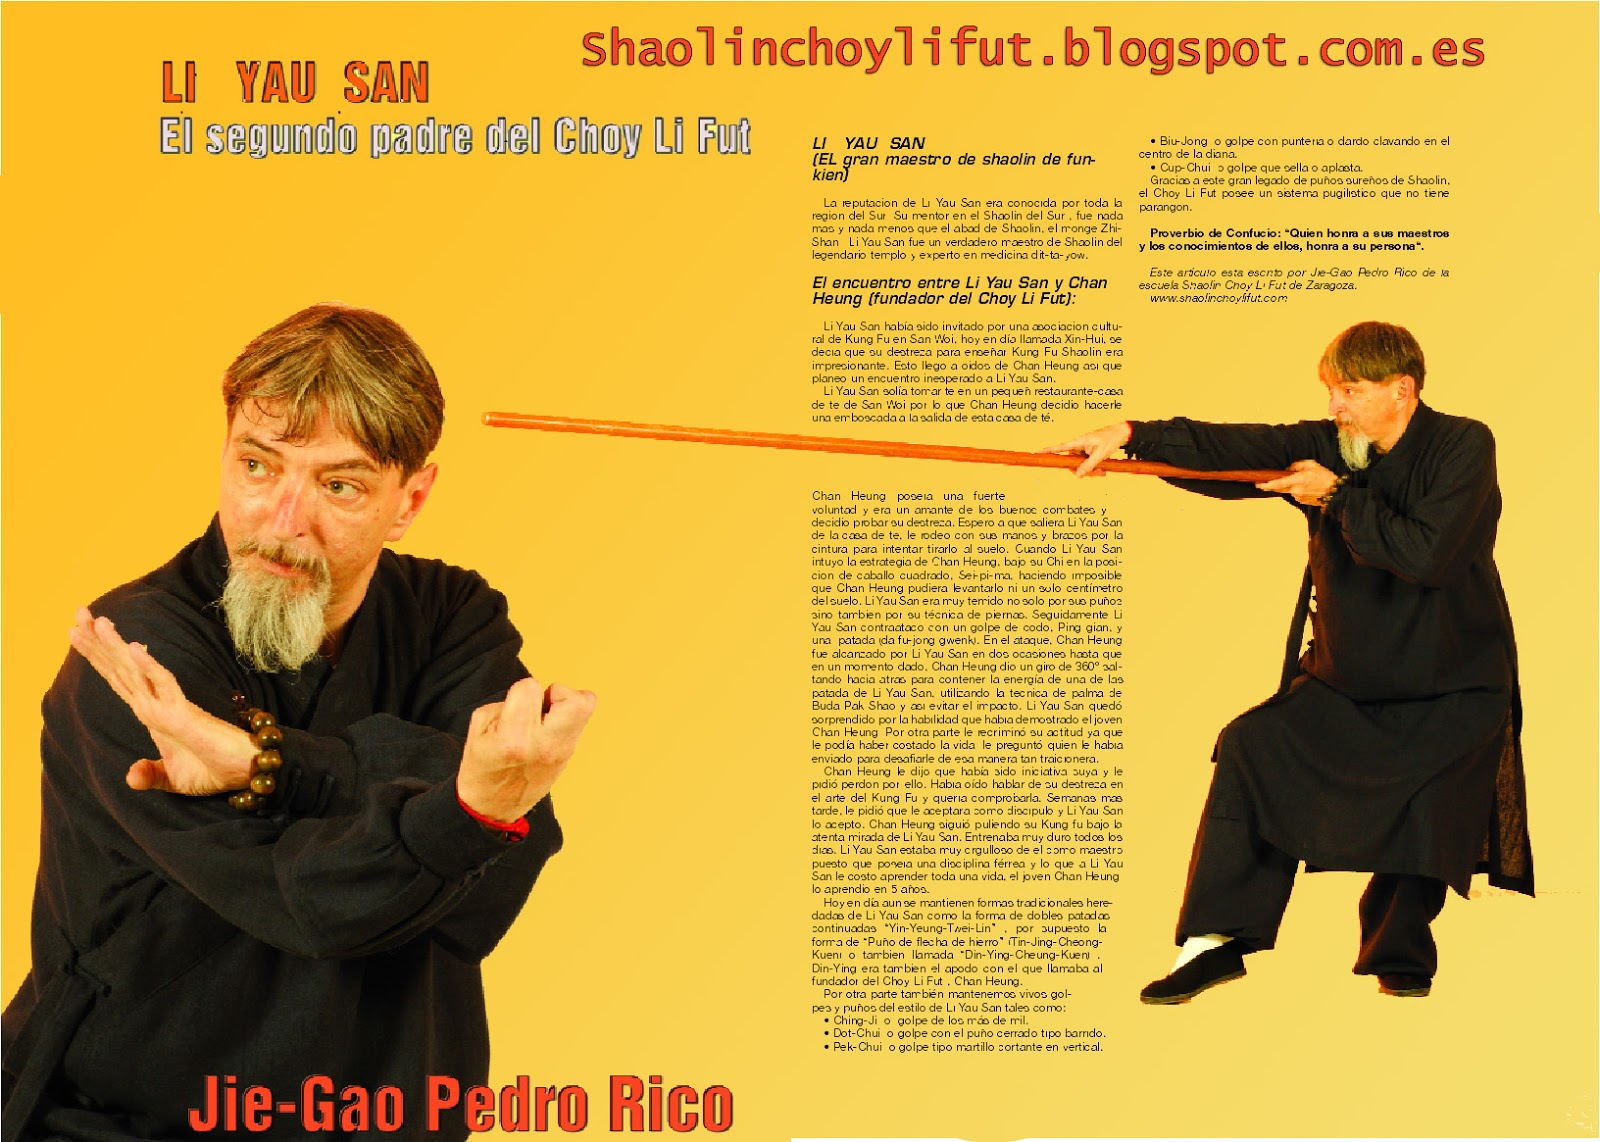 Li Yau San, el segundo padre del Choy Li Fut kung fu